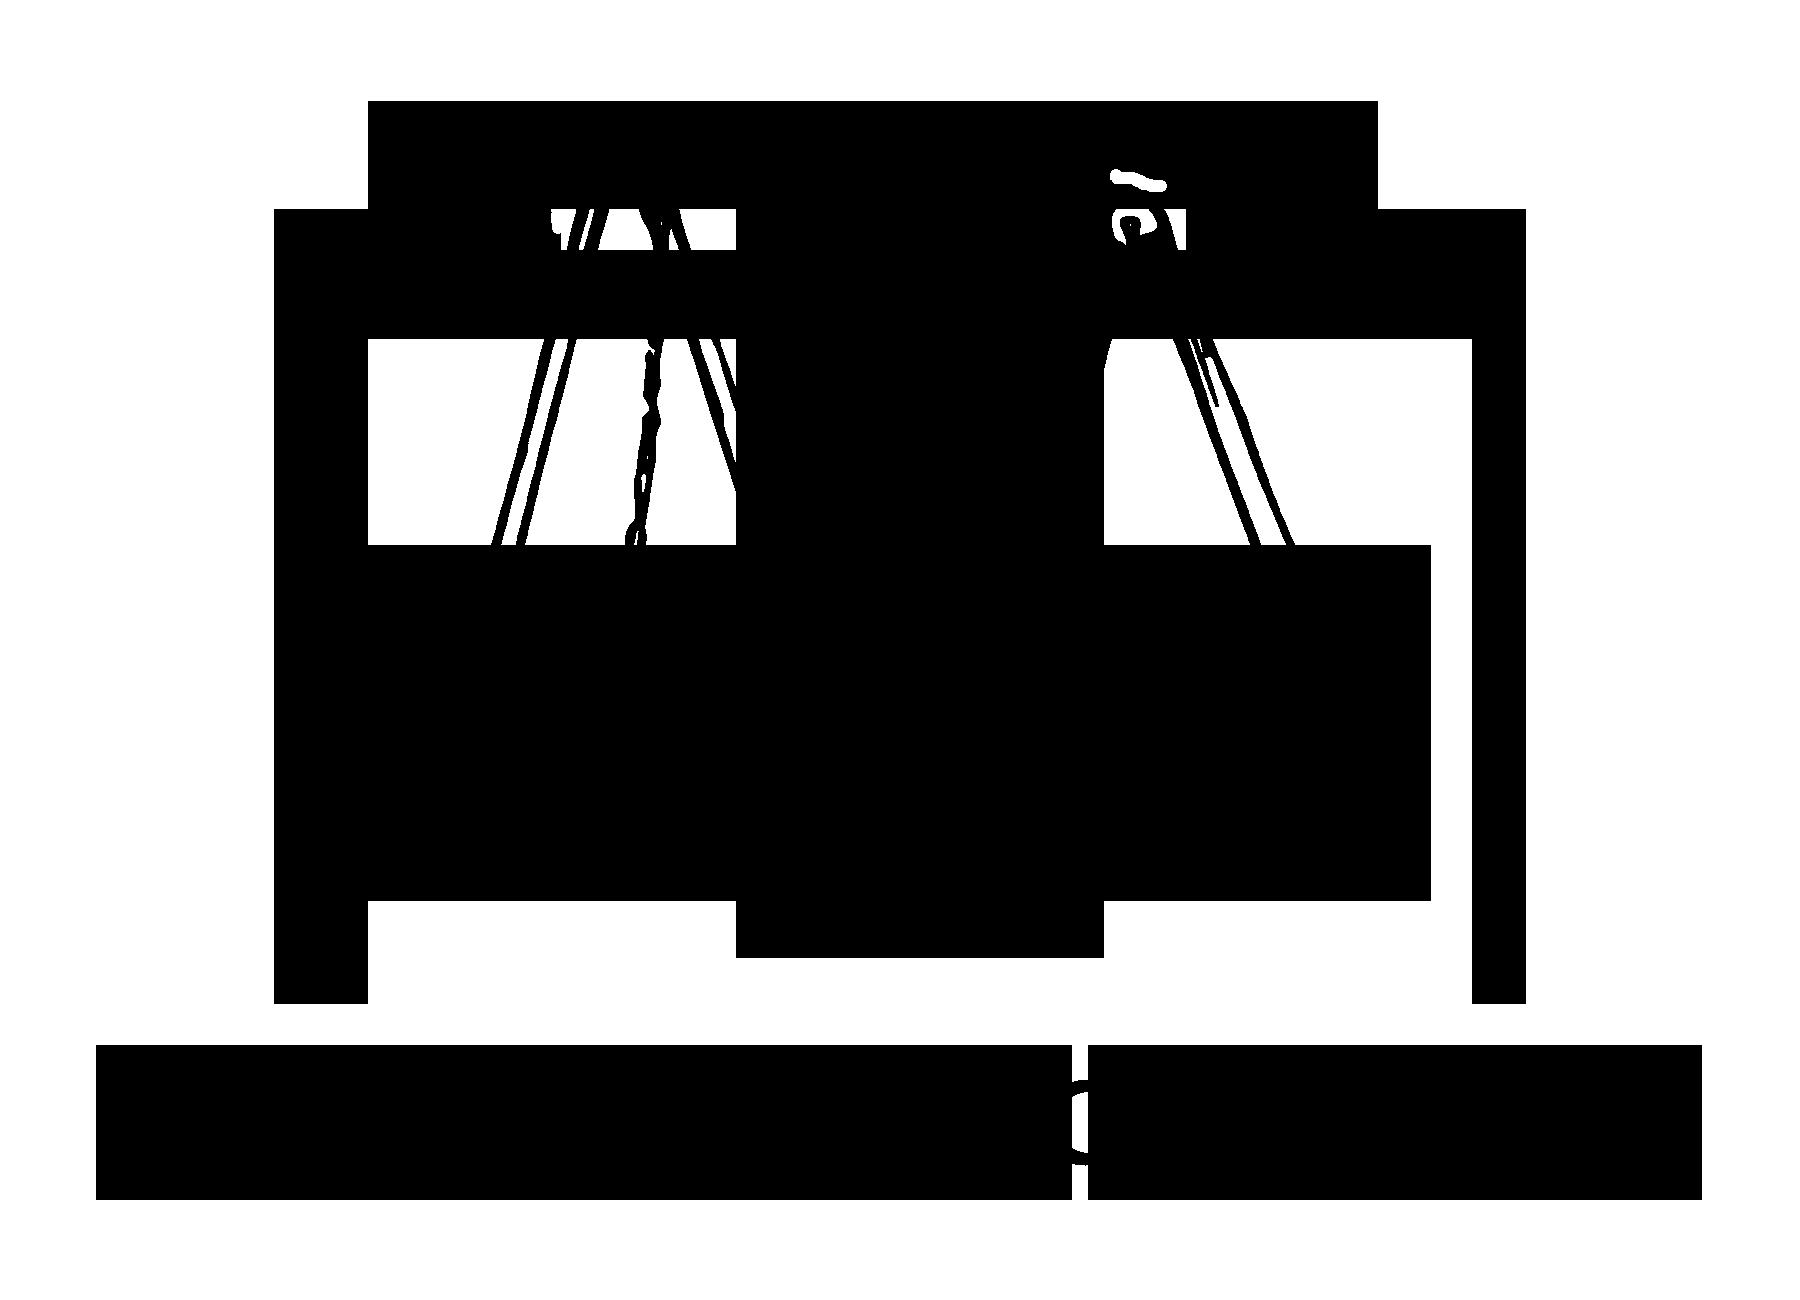 backyard capital logo with swing set